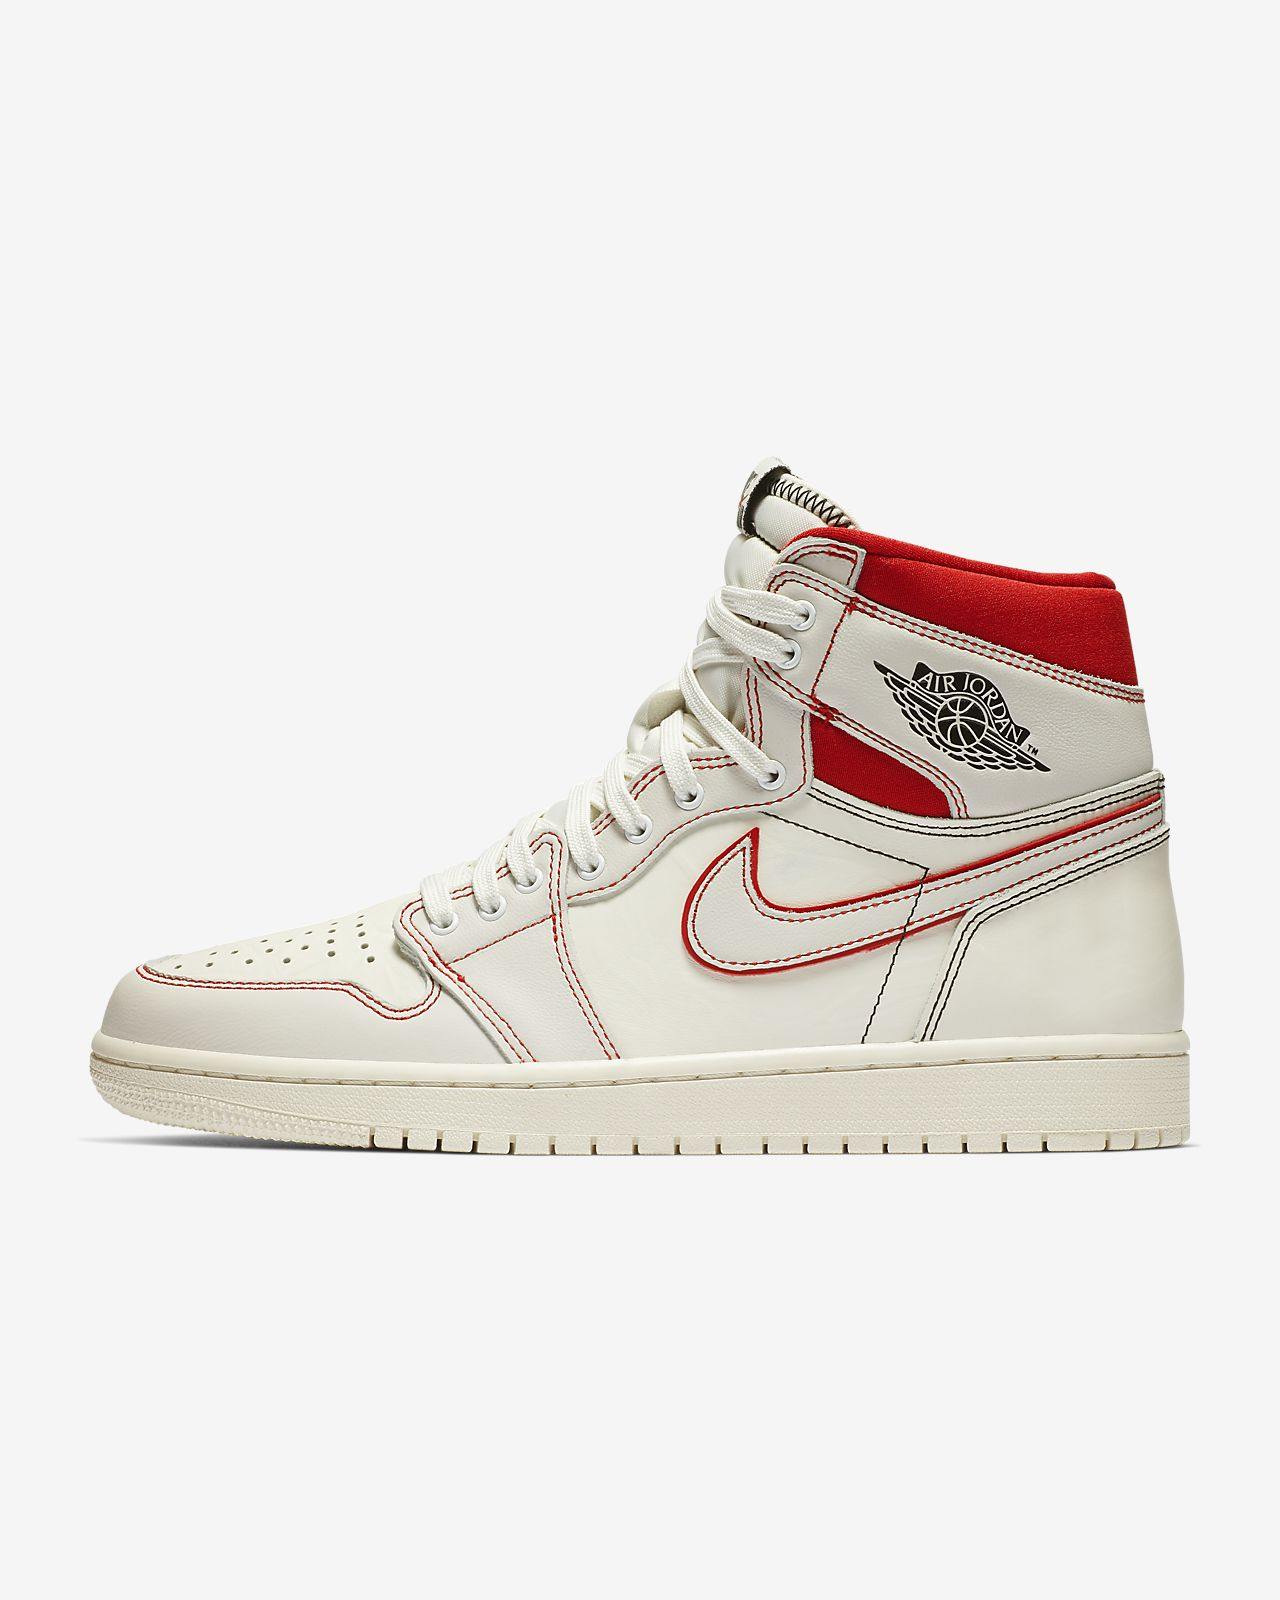 new styles 0352e 94a0c ... Air Jordan 1 Retro High OG Shoe